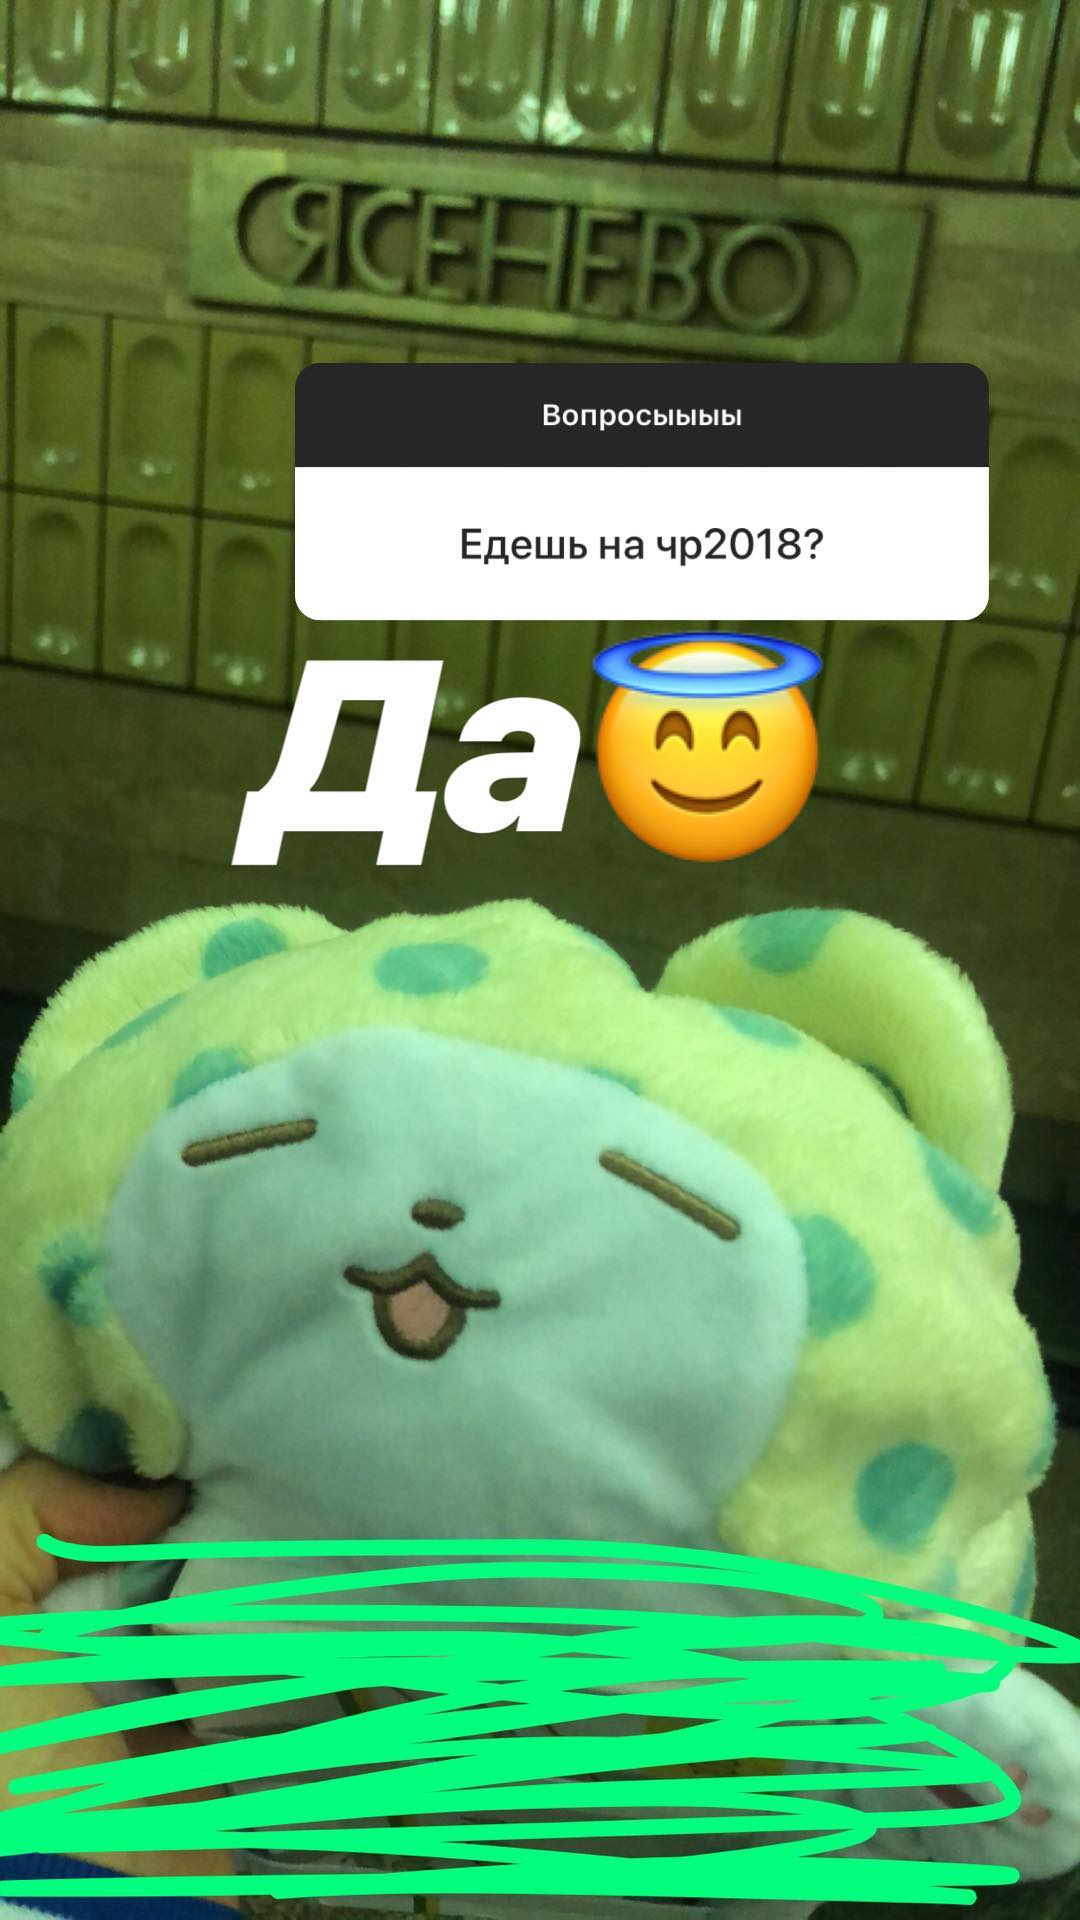 Дарья Паненкова - Страница 8 Kvmkvtb_MsI